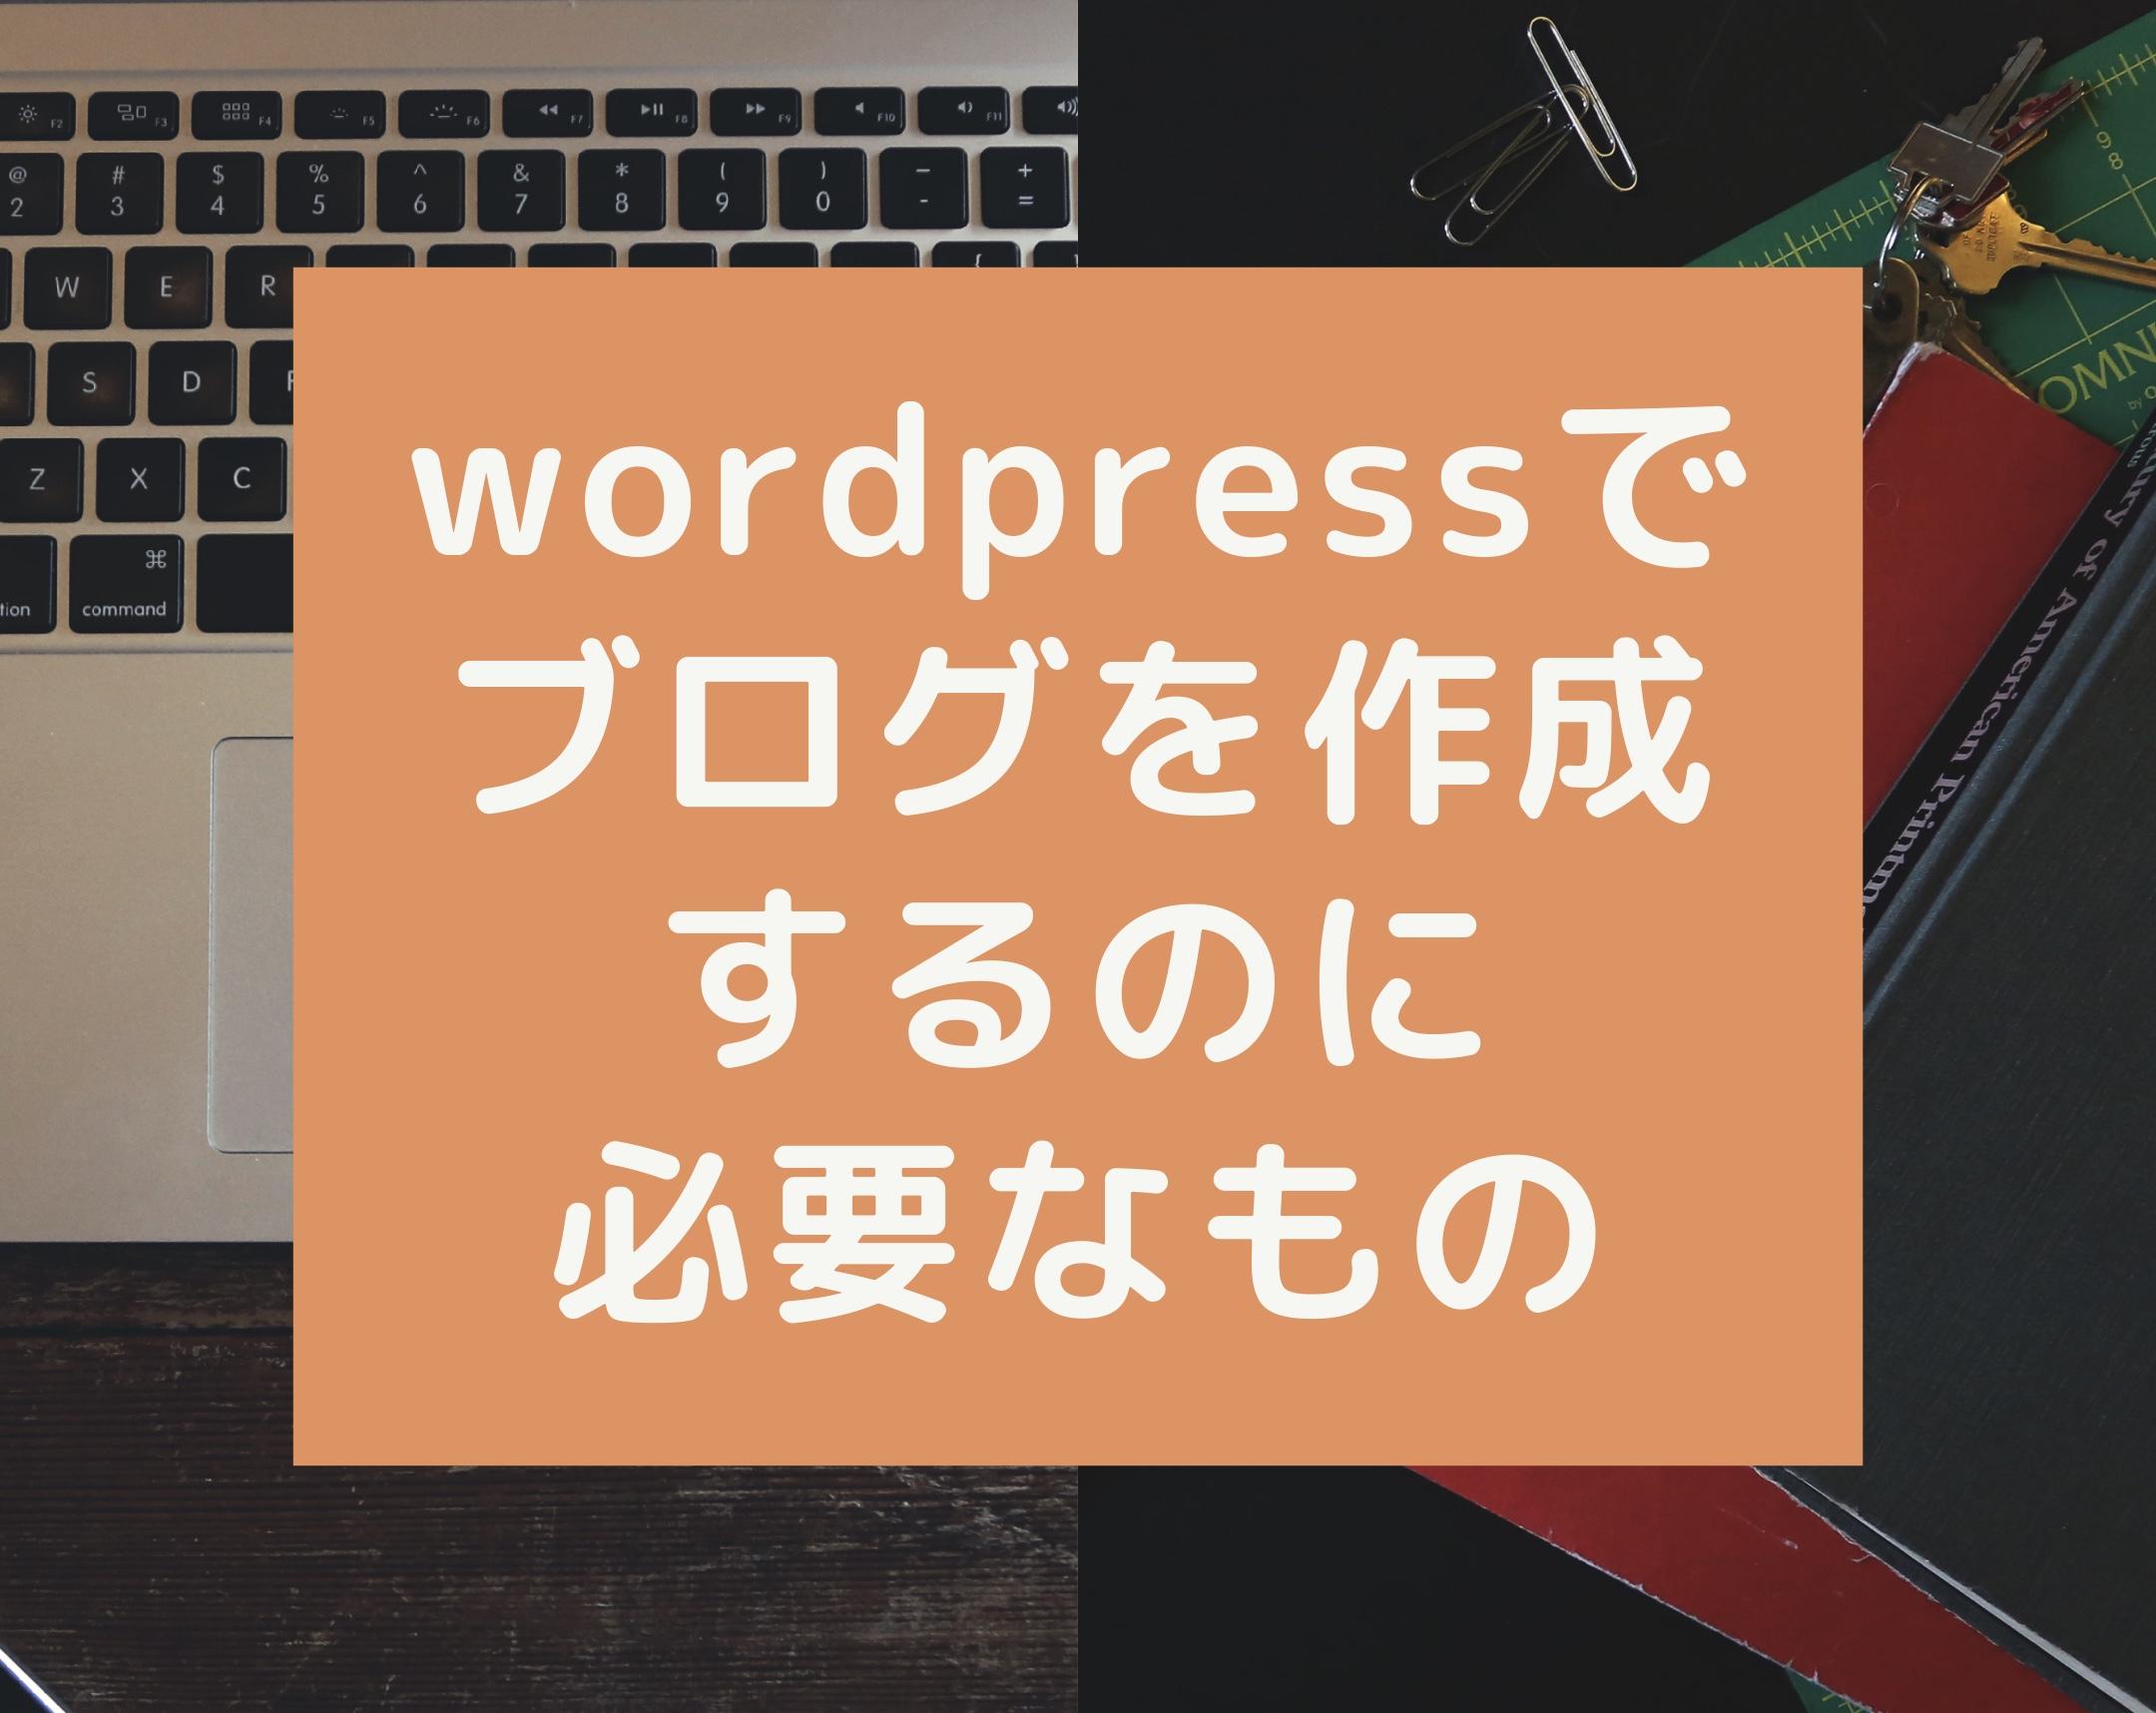 WordPressでブログを作成するために必要なもの